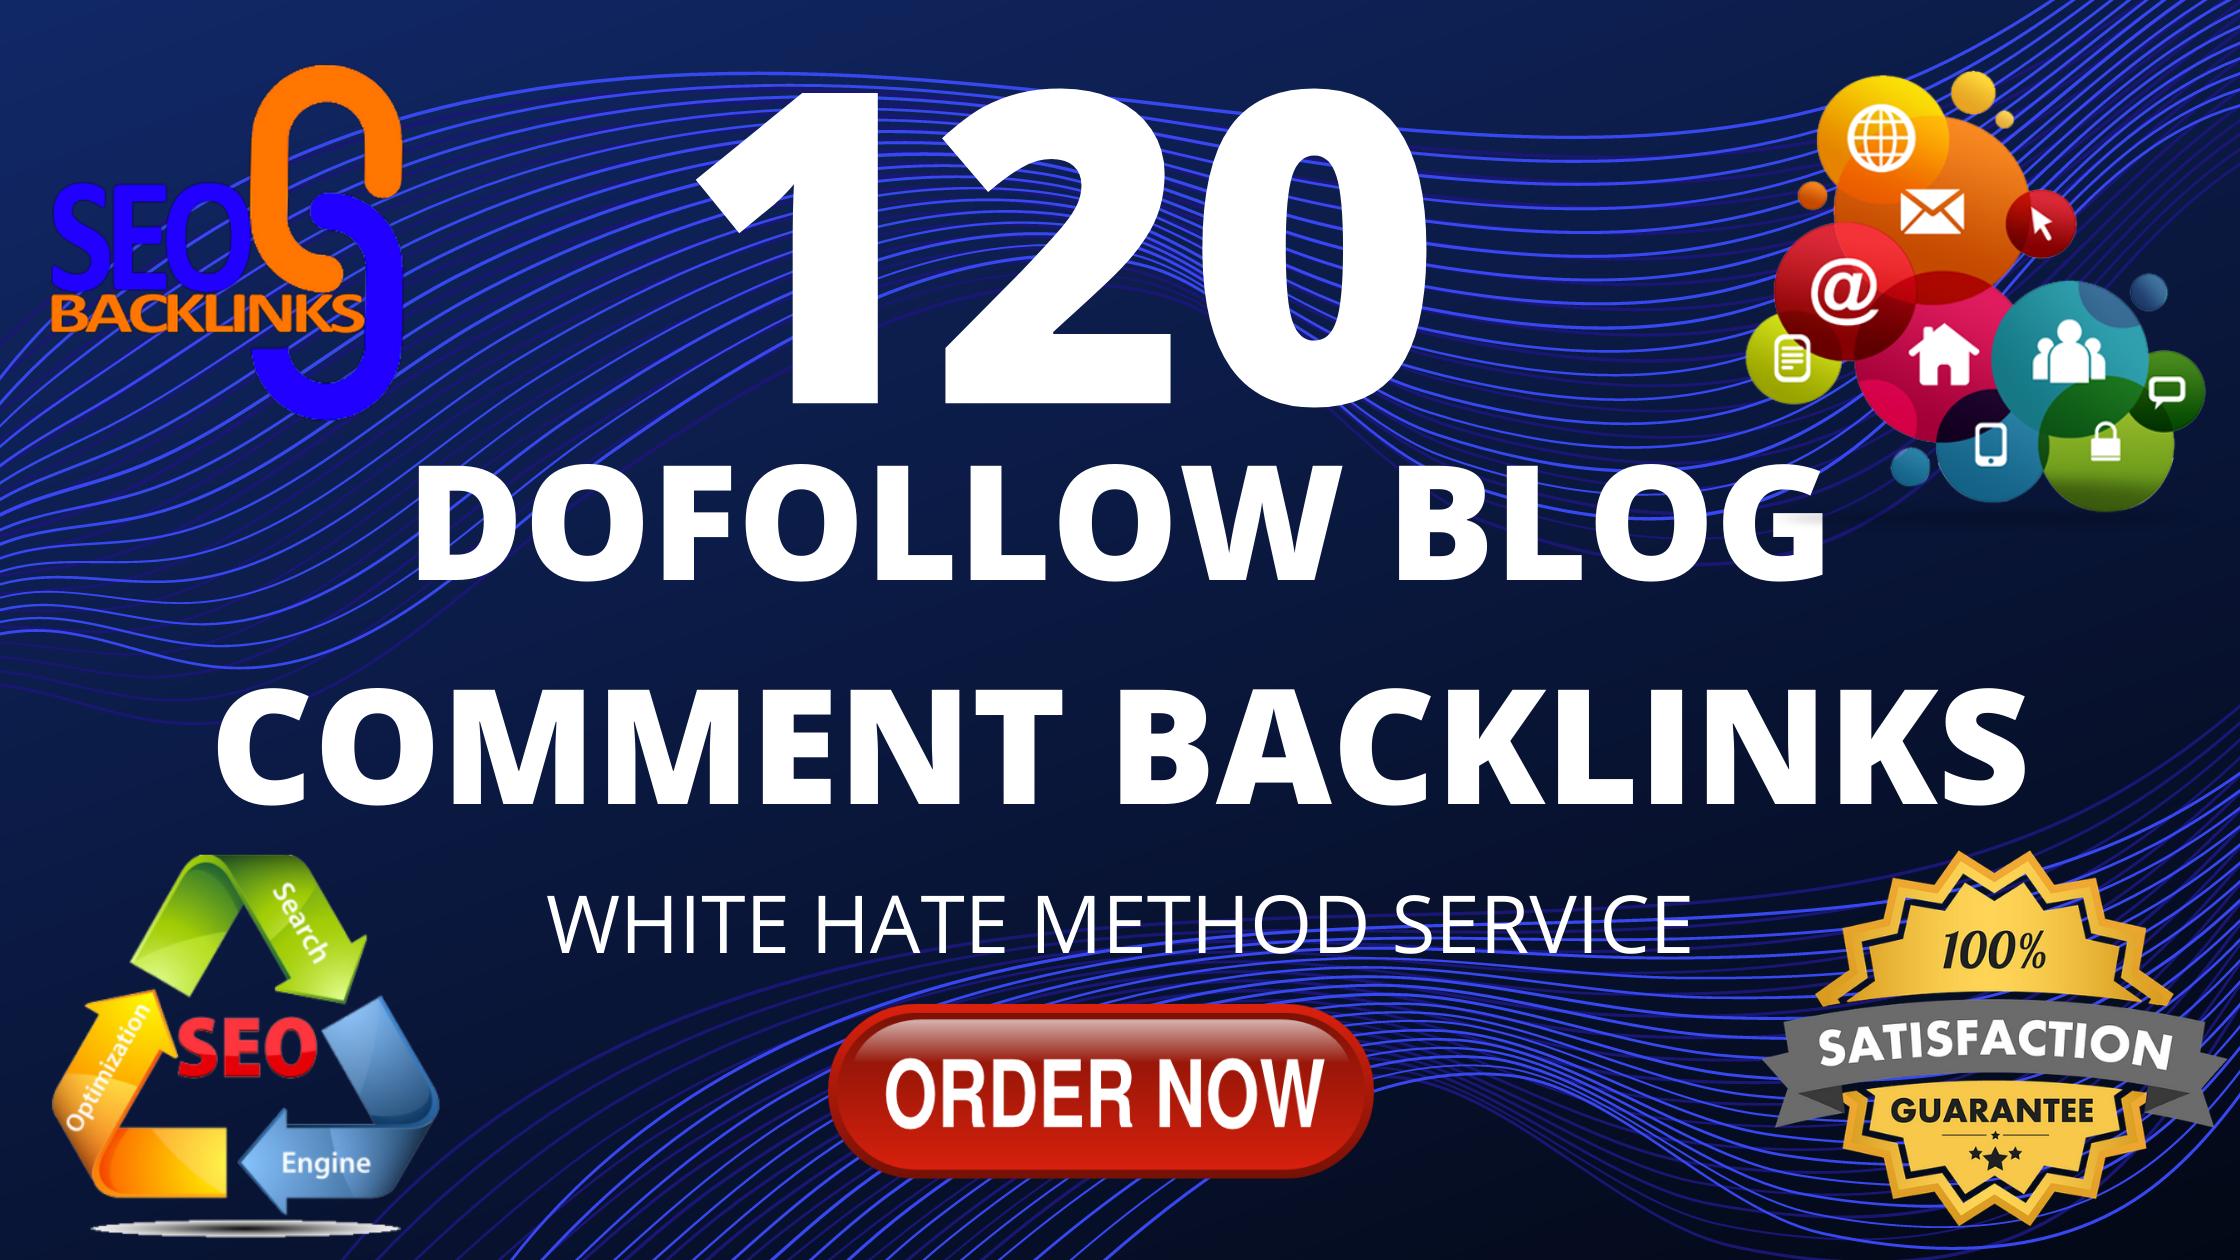 i will provide 120 dofollow blog comment backlinks